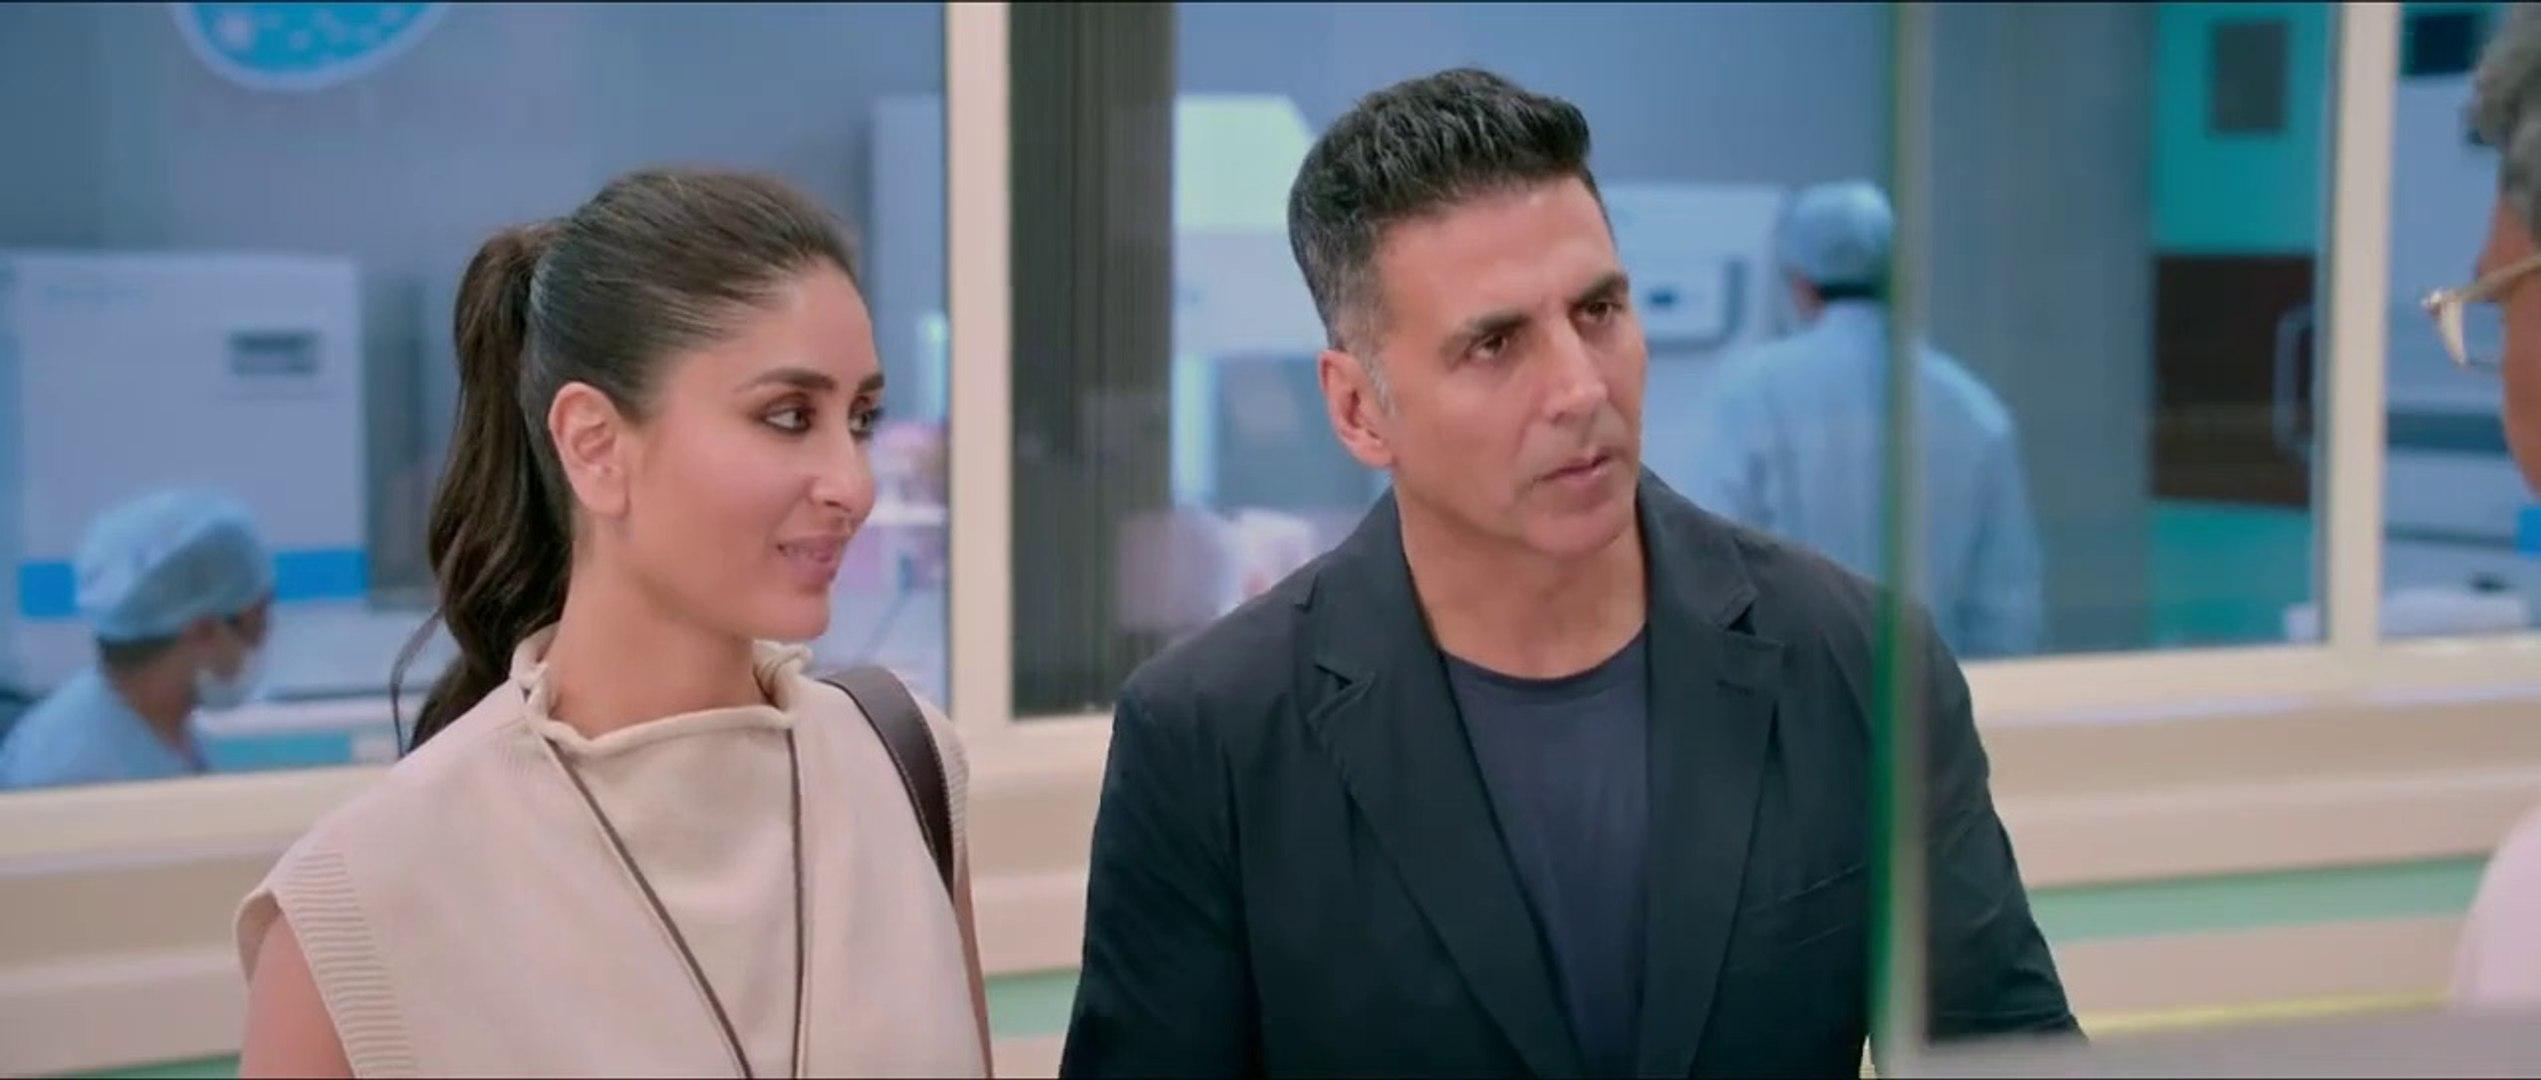 Good News Full Hd Akshay Kumar Kareena Kapoor New 2020 Video Dailymotion